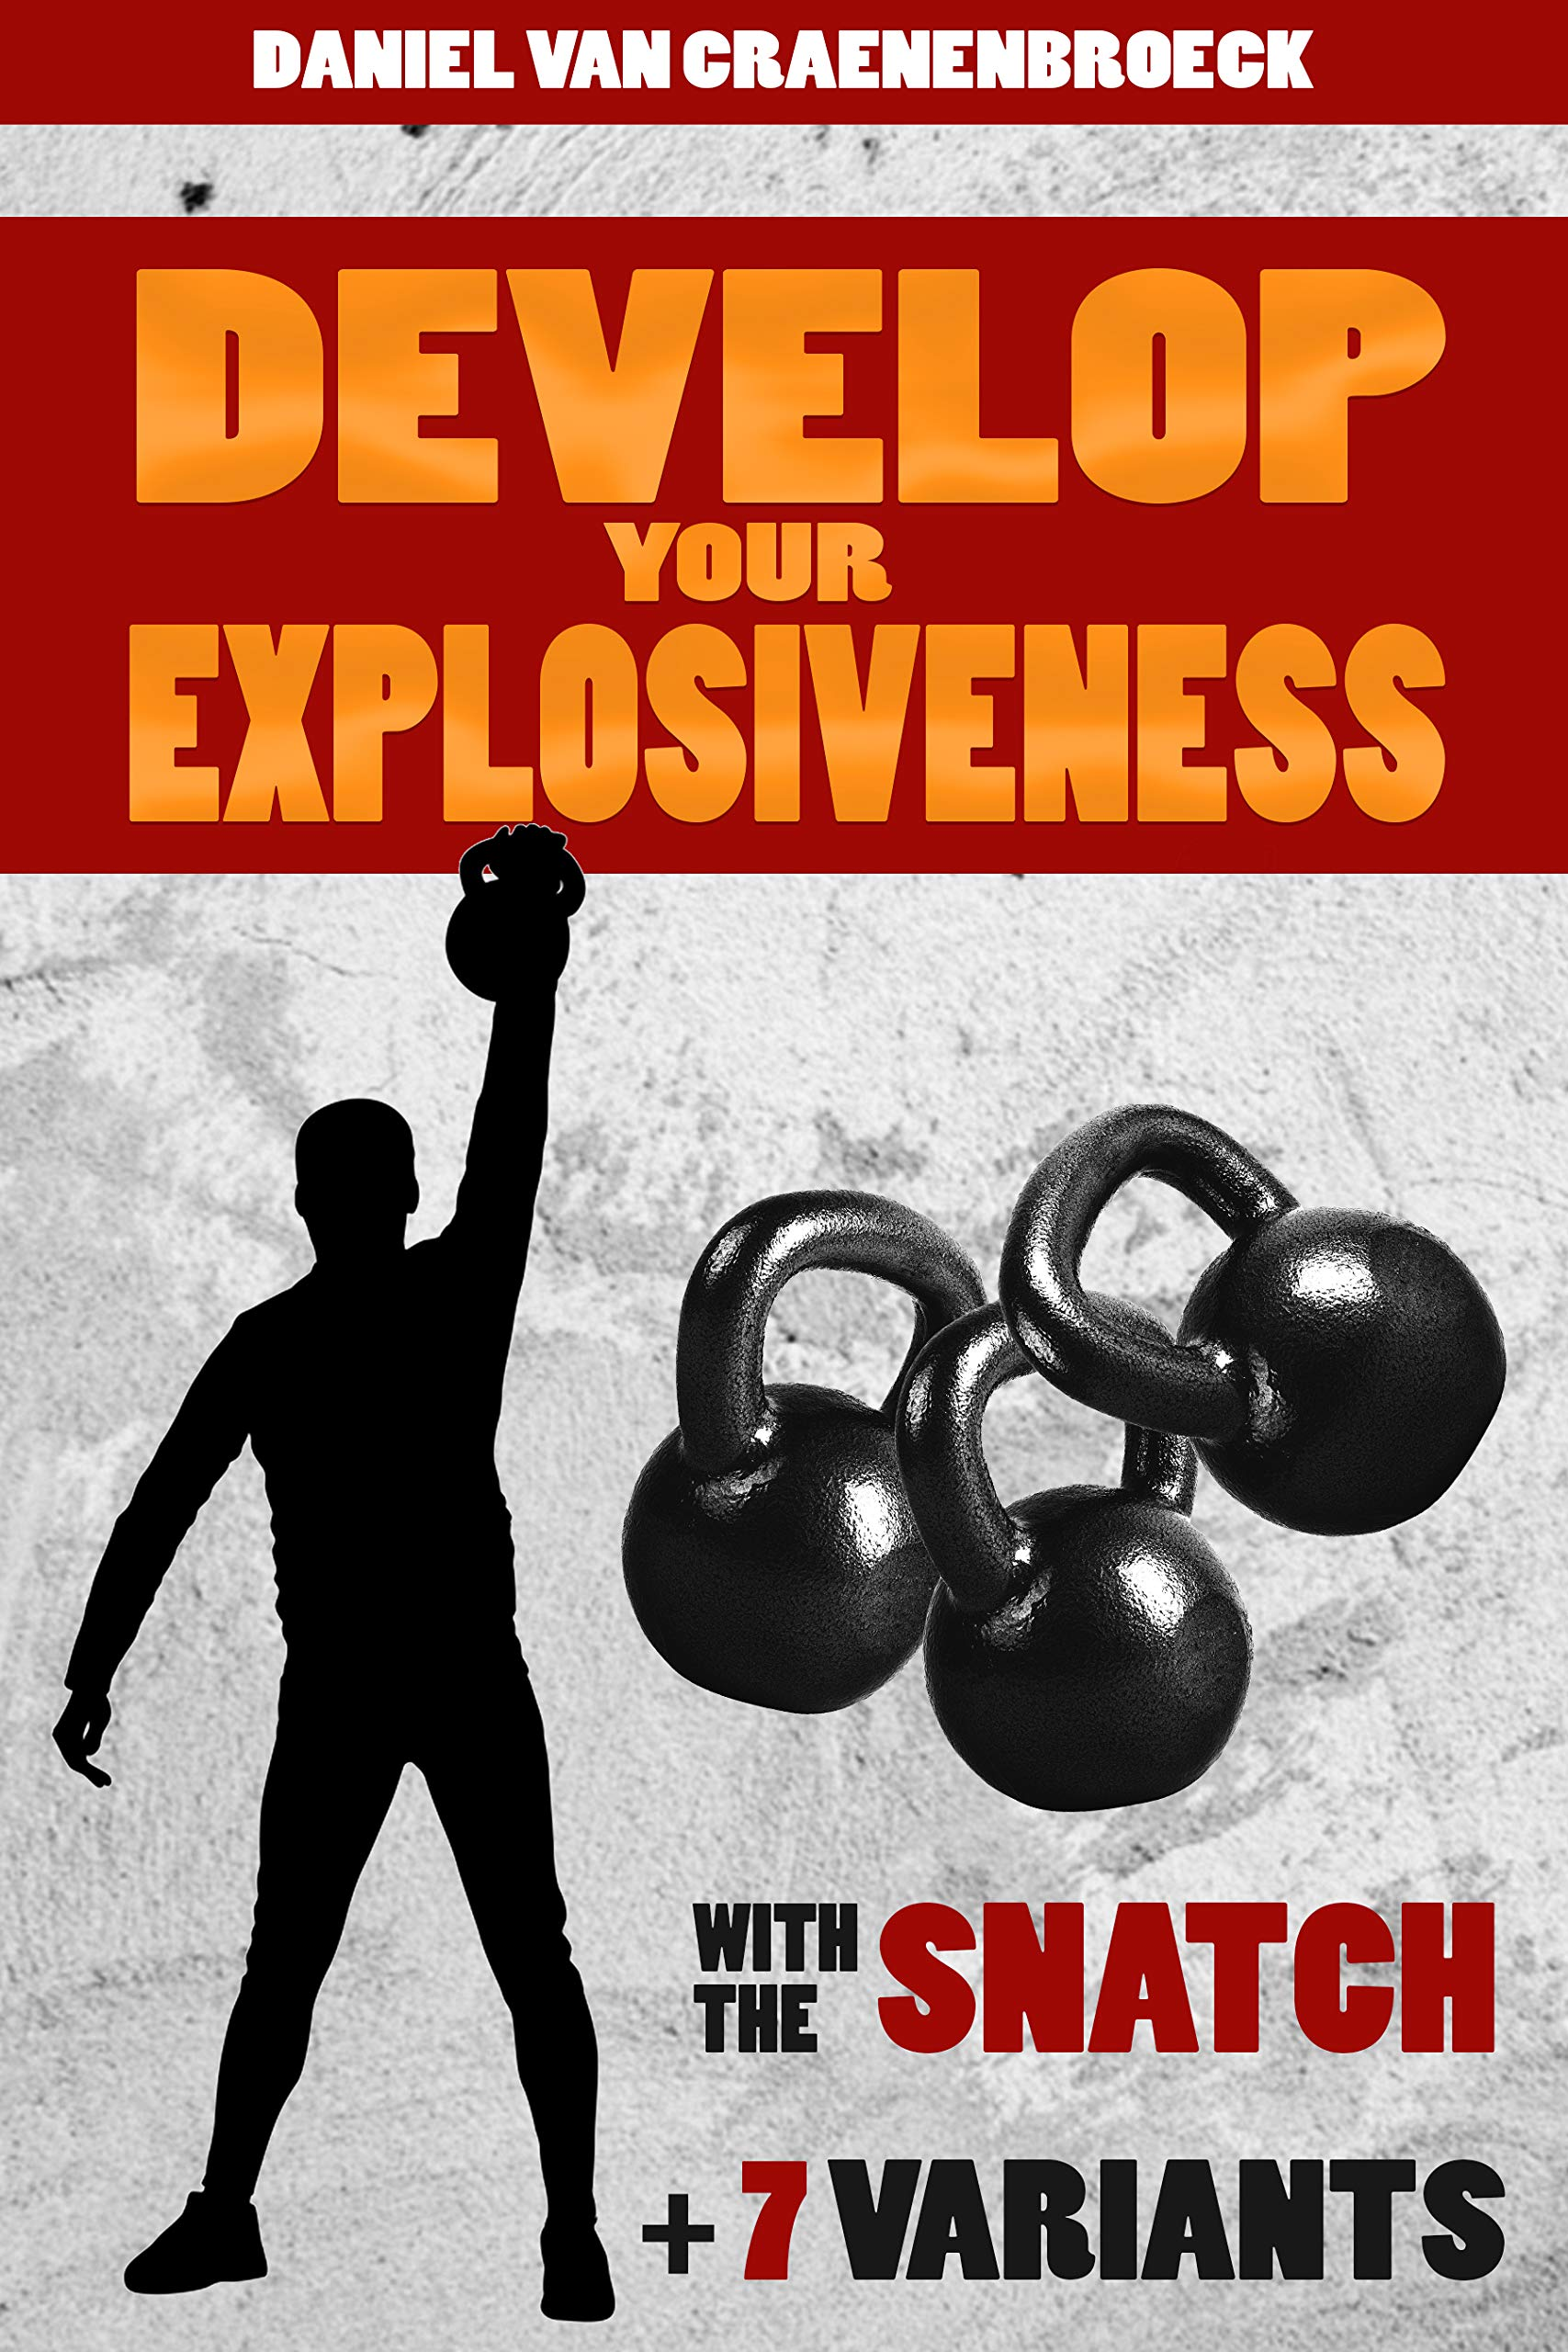 Develop your explosiveness with the Snatch and 7 variants Daniel Van Craenenbroeck